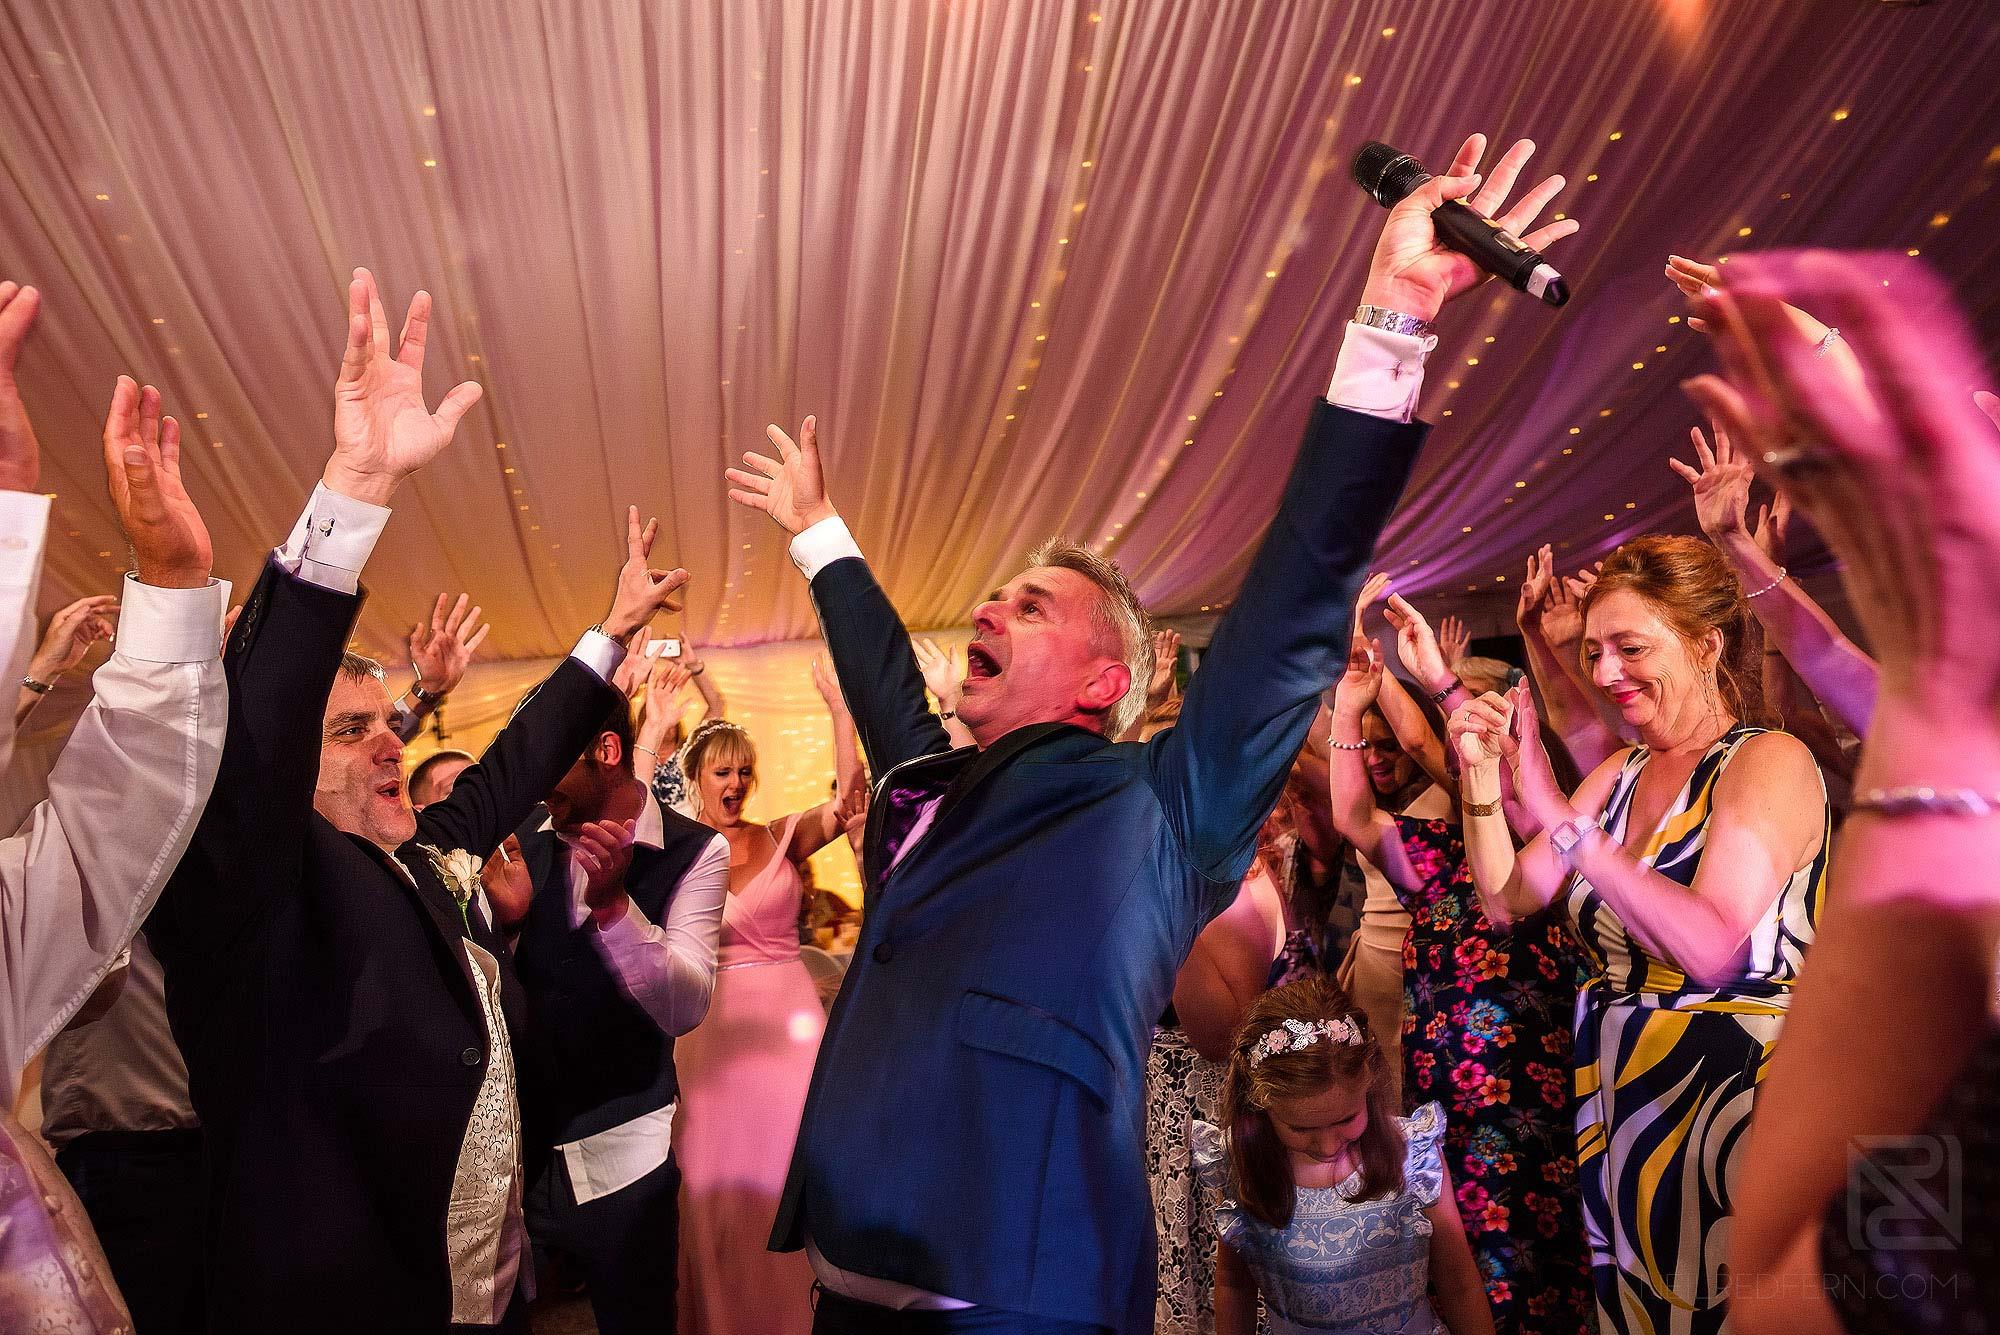 Paul Guard entertaining wedding at The Villa Wrea Green